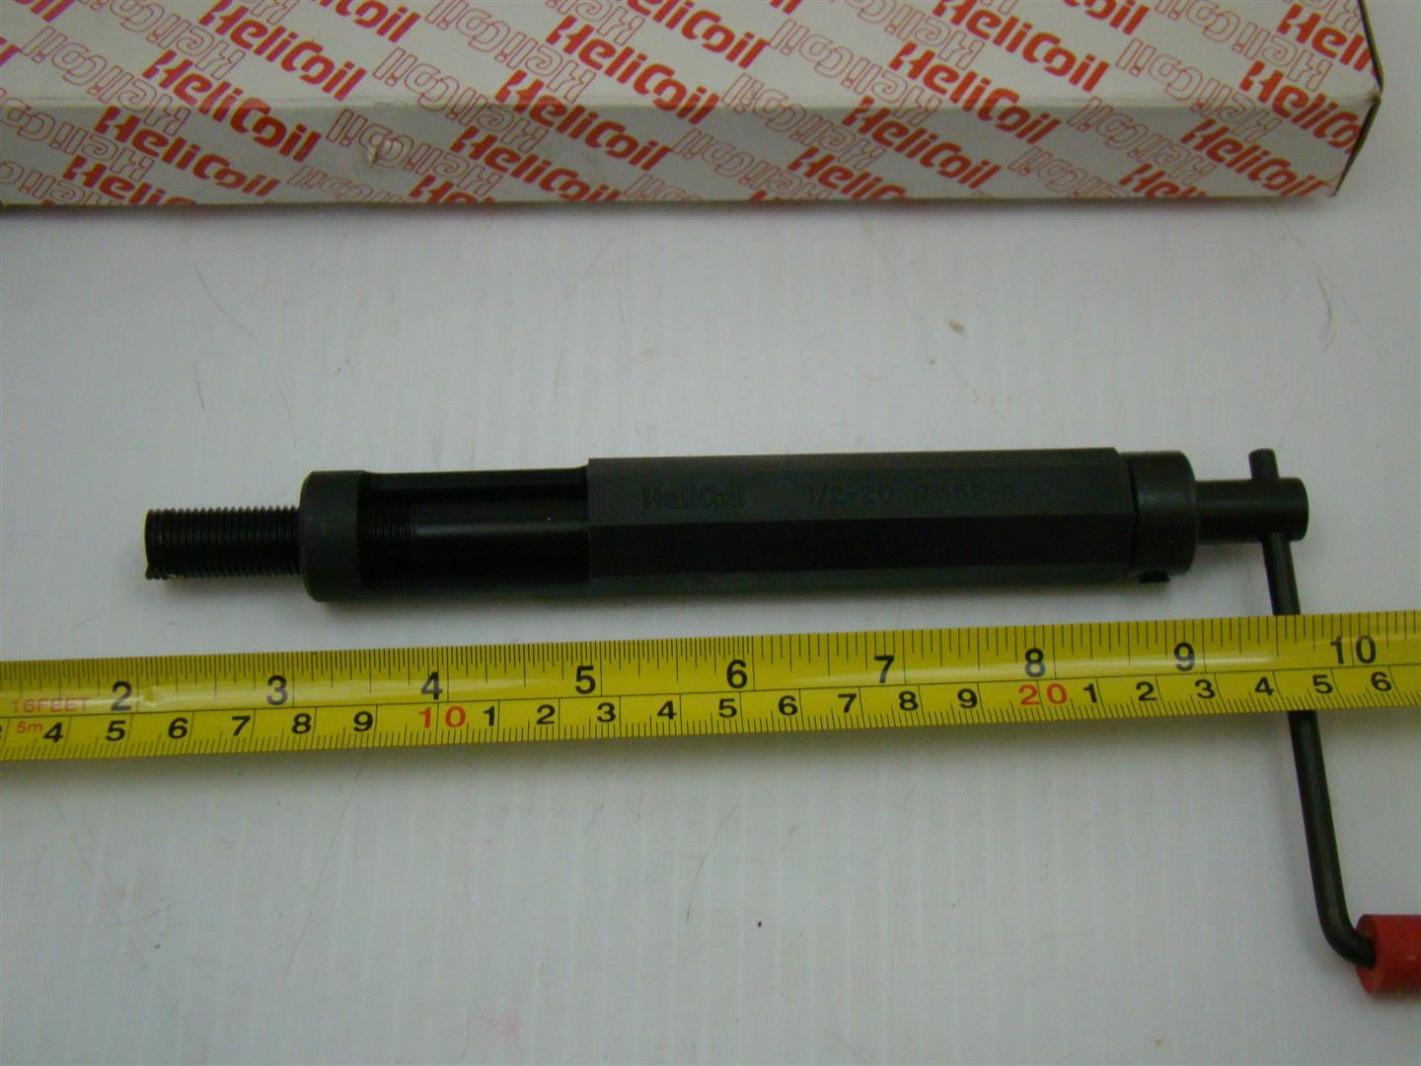 Helicoil Inserting Tool 1 2 20 7552 8 Joseph Fazzio